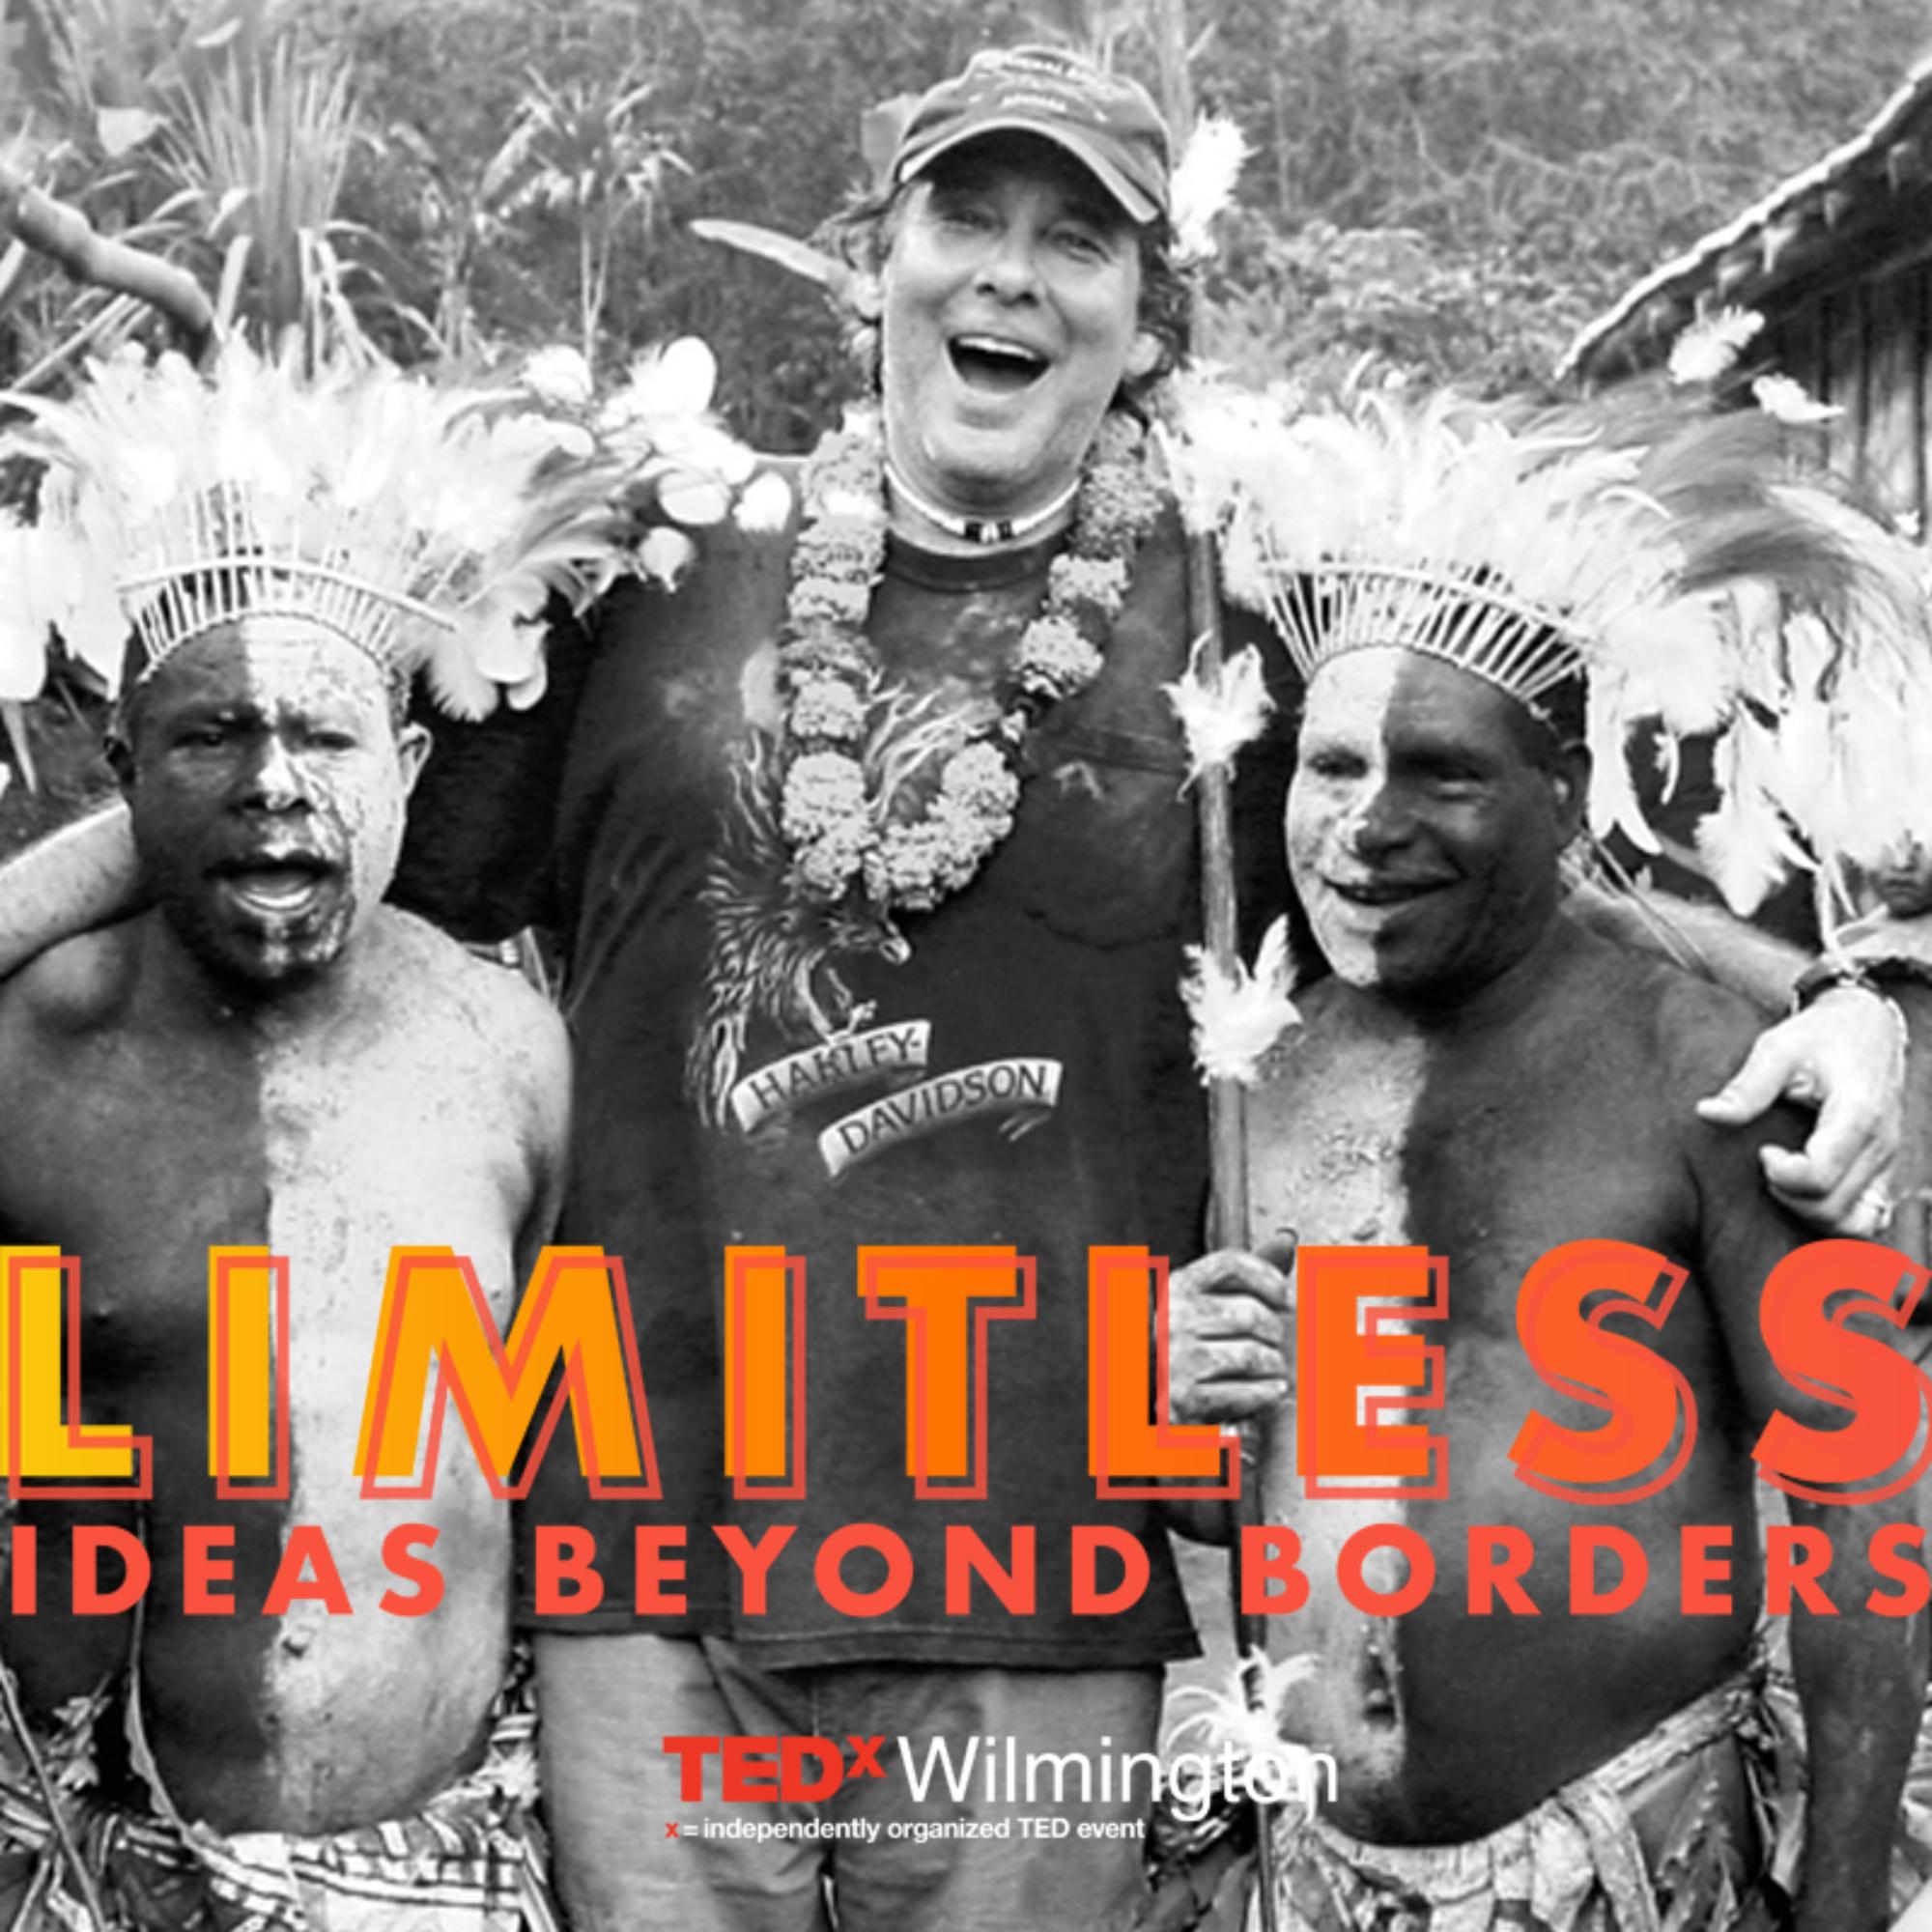 Speaking at TEDx Wilmington August 2017